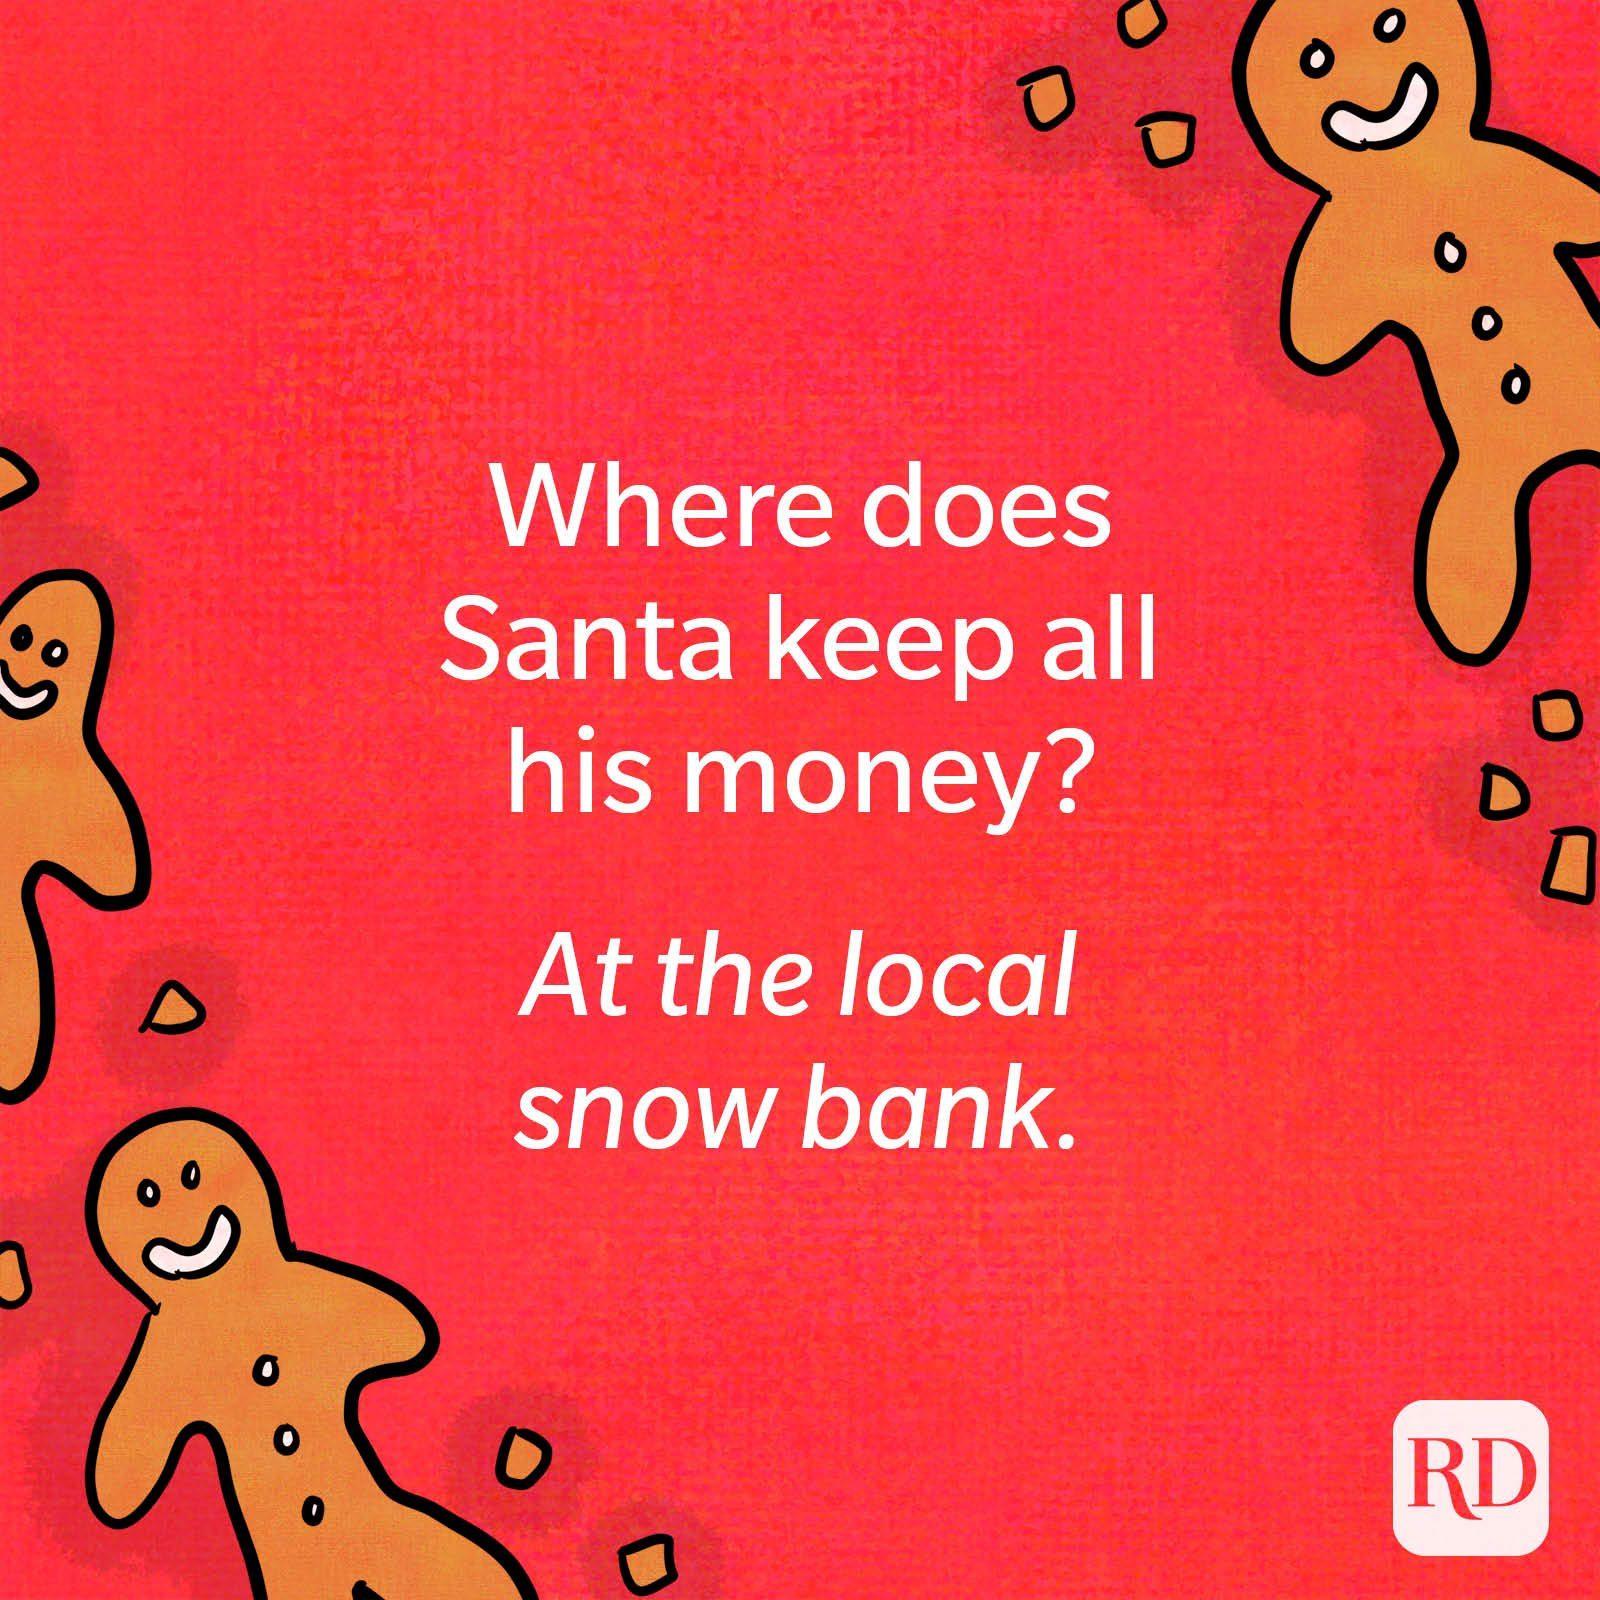 Where does Santa keep all his money?